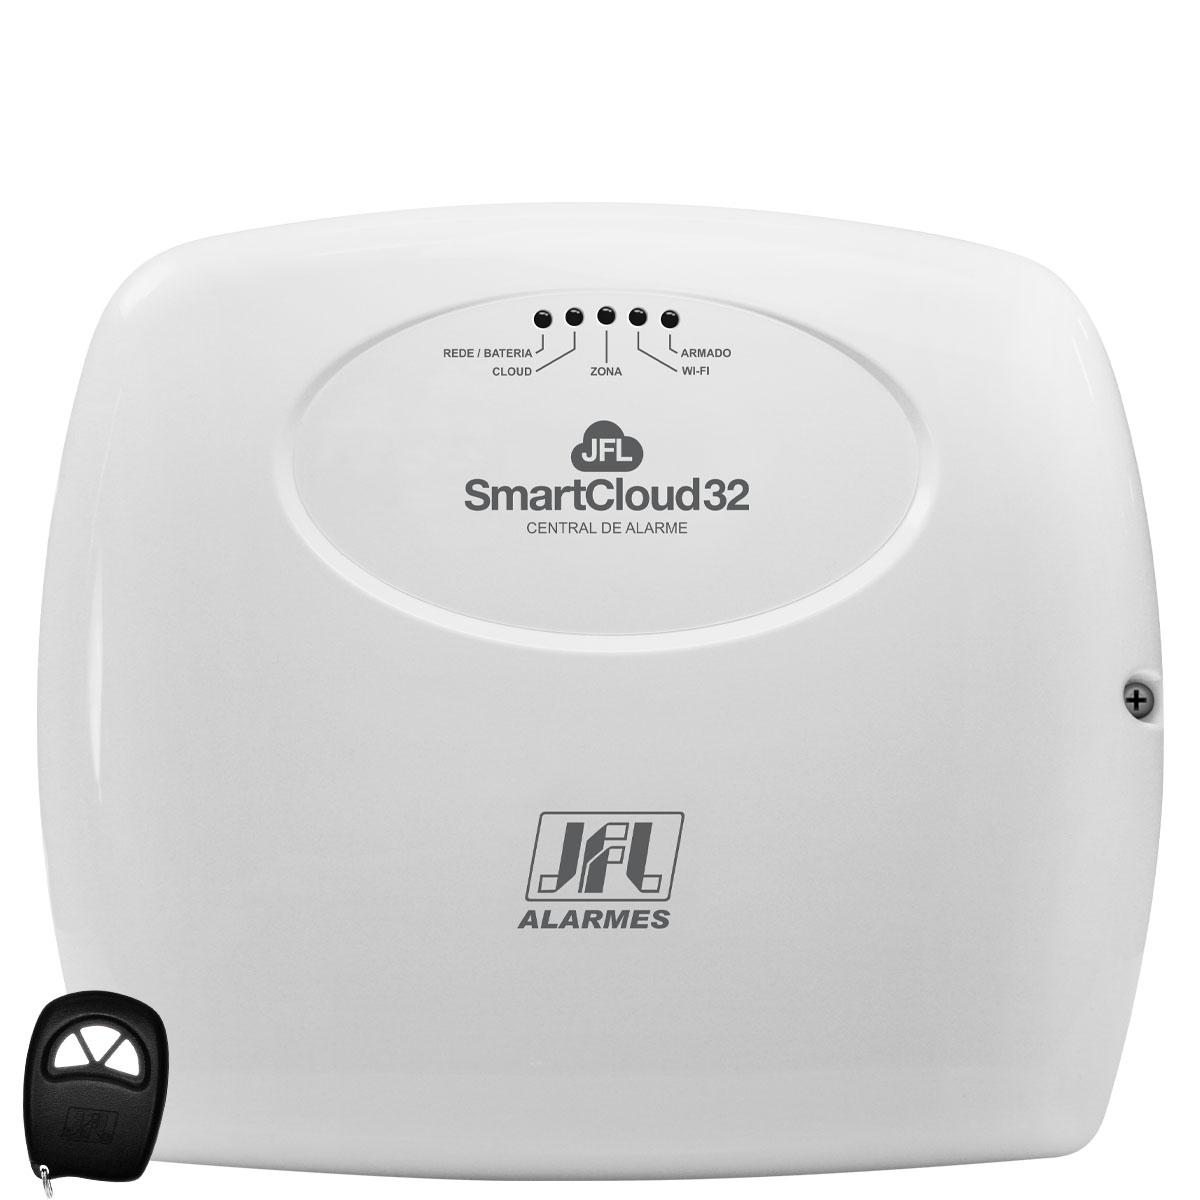 Kit Alarme SmartCloud 32 Jfl Com Sensores Idx 1001